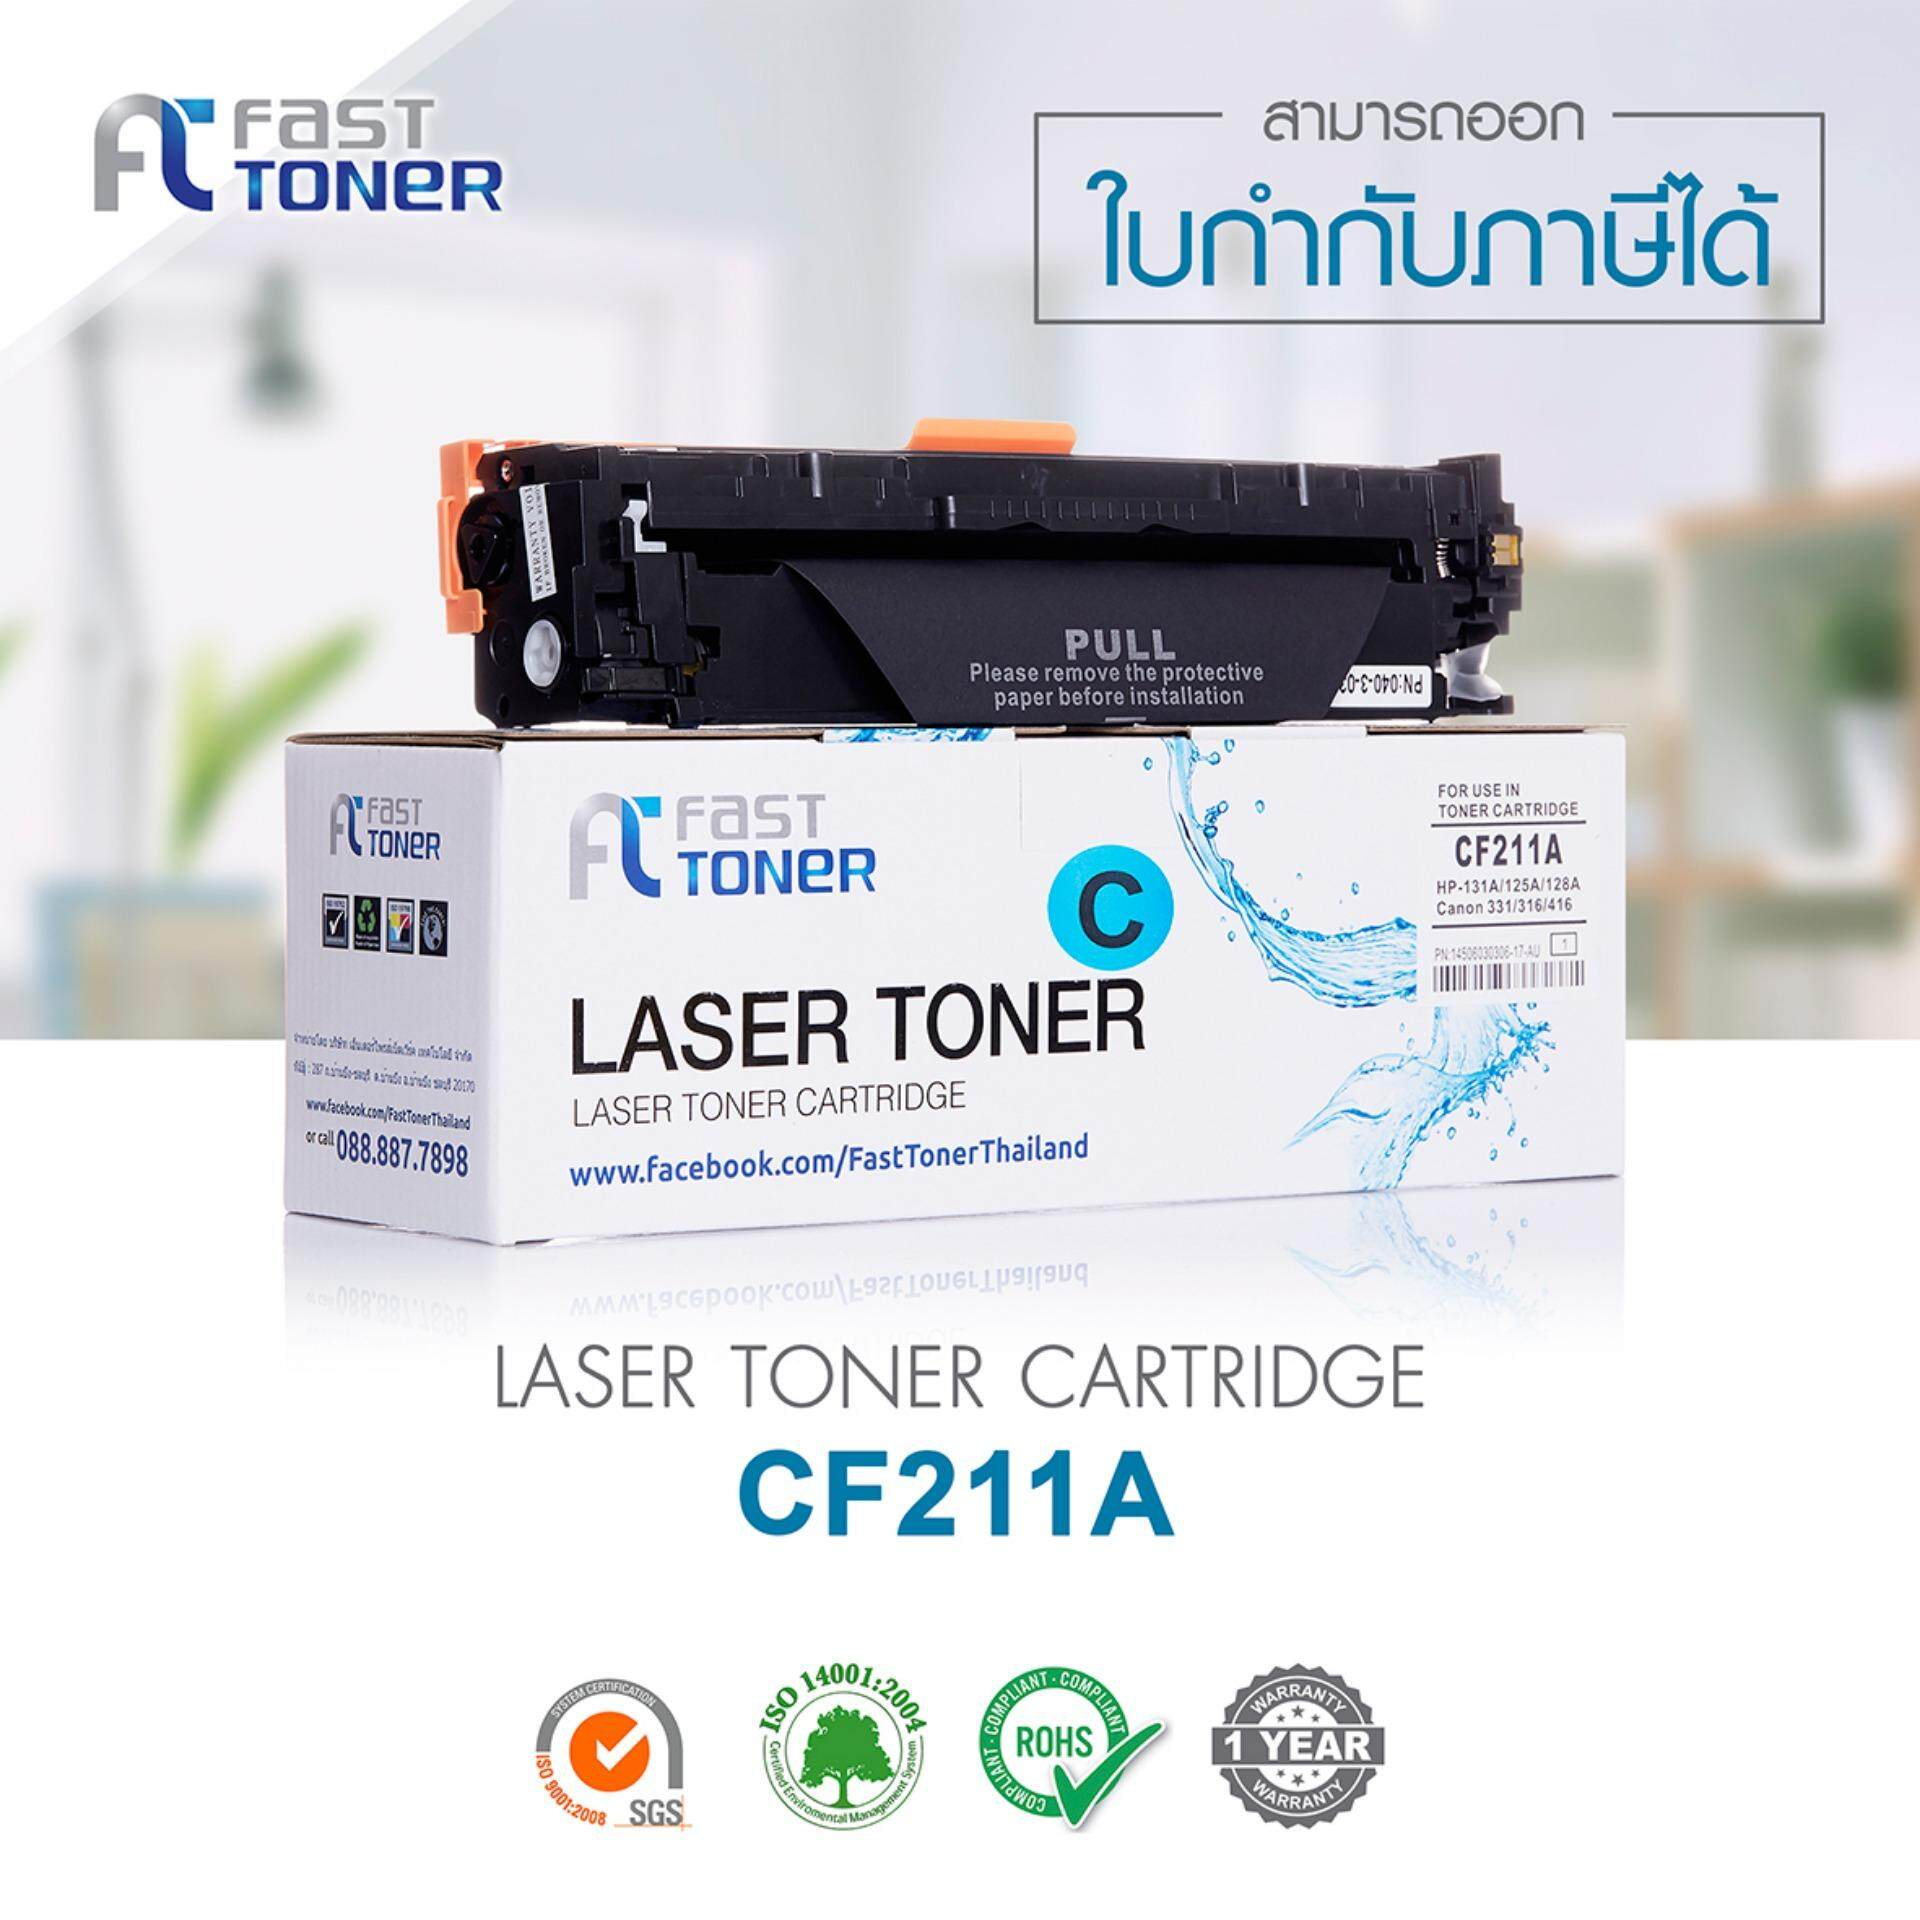 Fast Toner HP 131A Fast Toner Cartridge CF211A (Cyan) (ฟ้า)